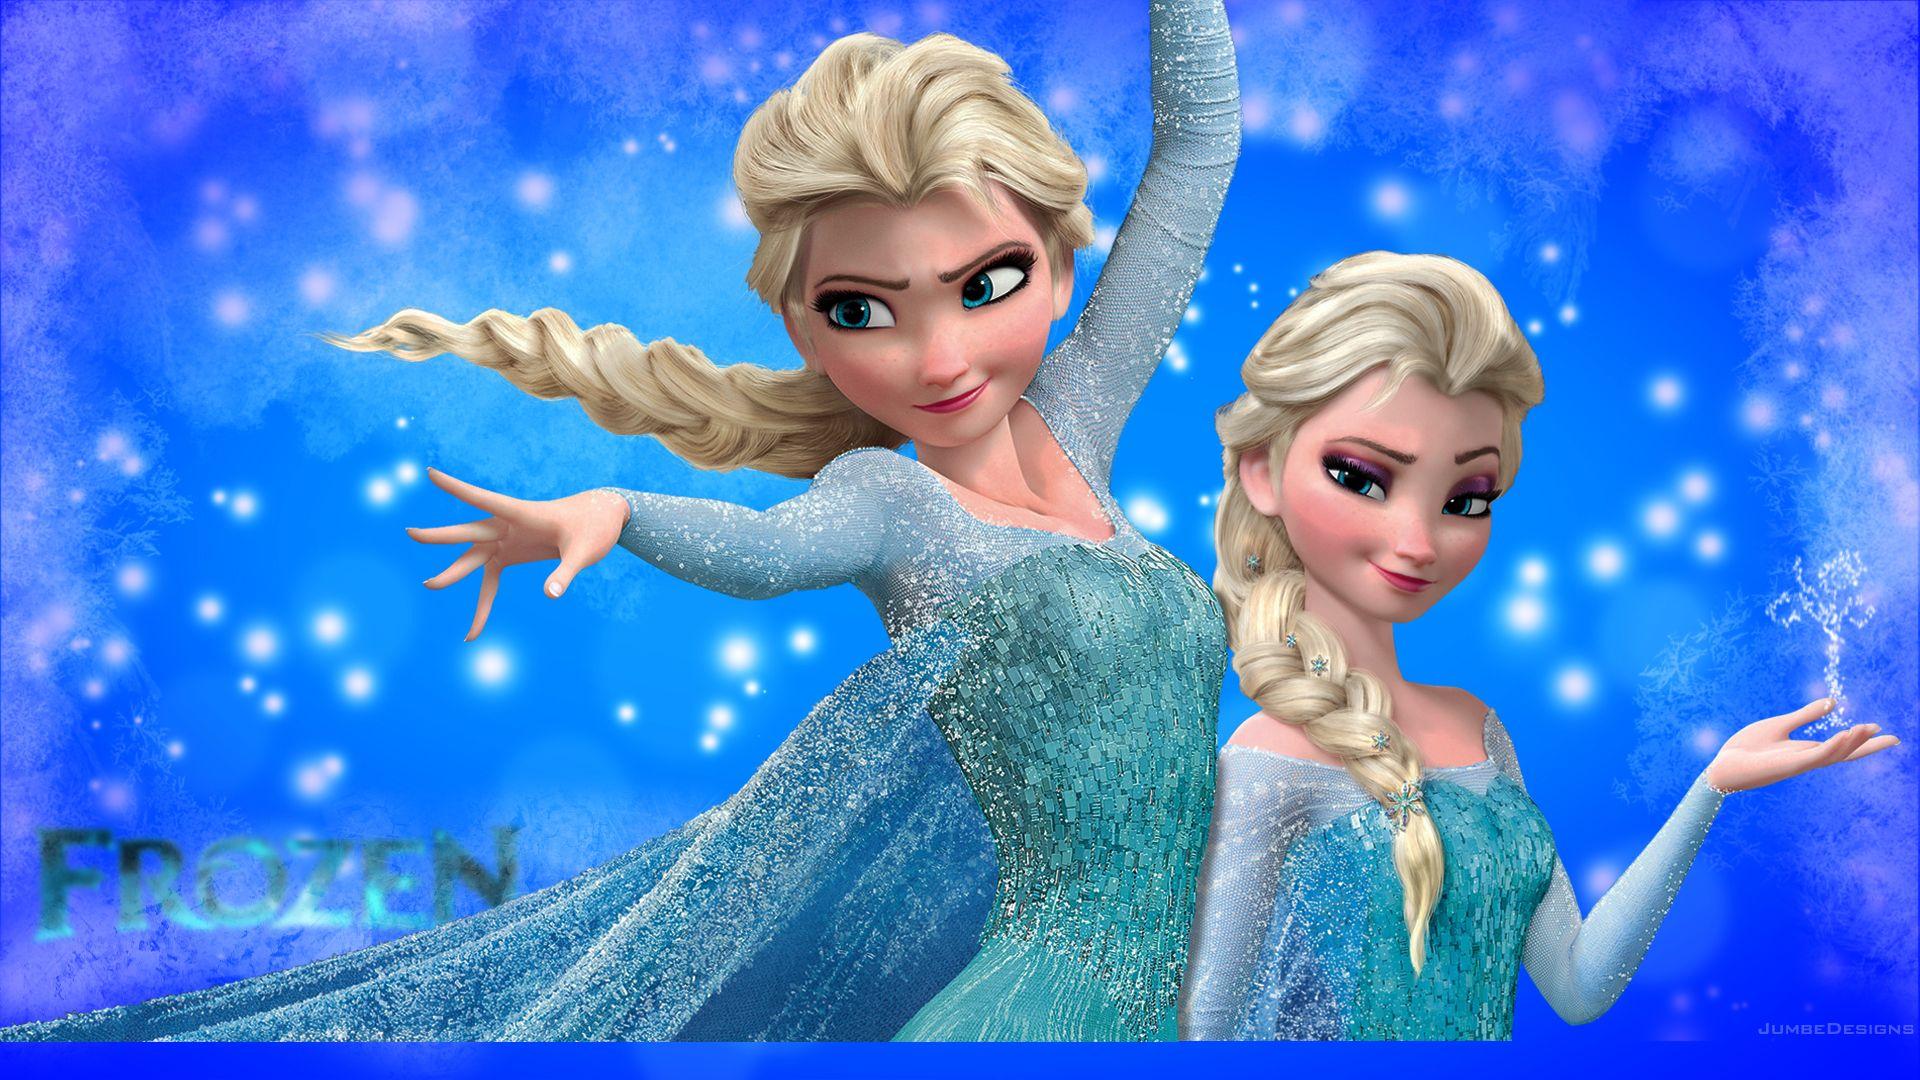 Frozen Elsa Wallpapers Free download latest Frozen Elsa